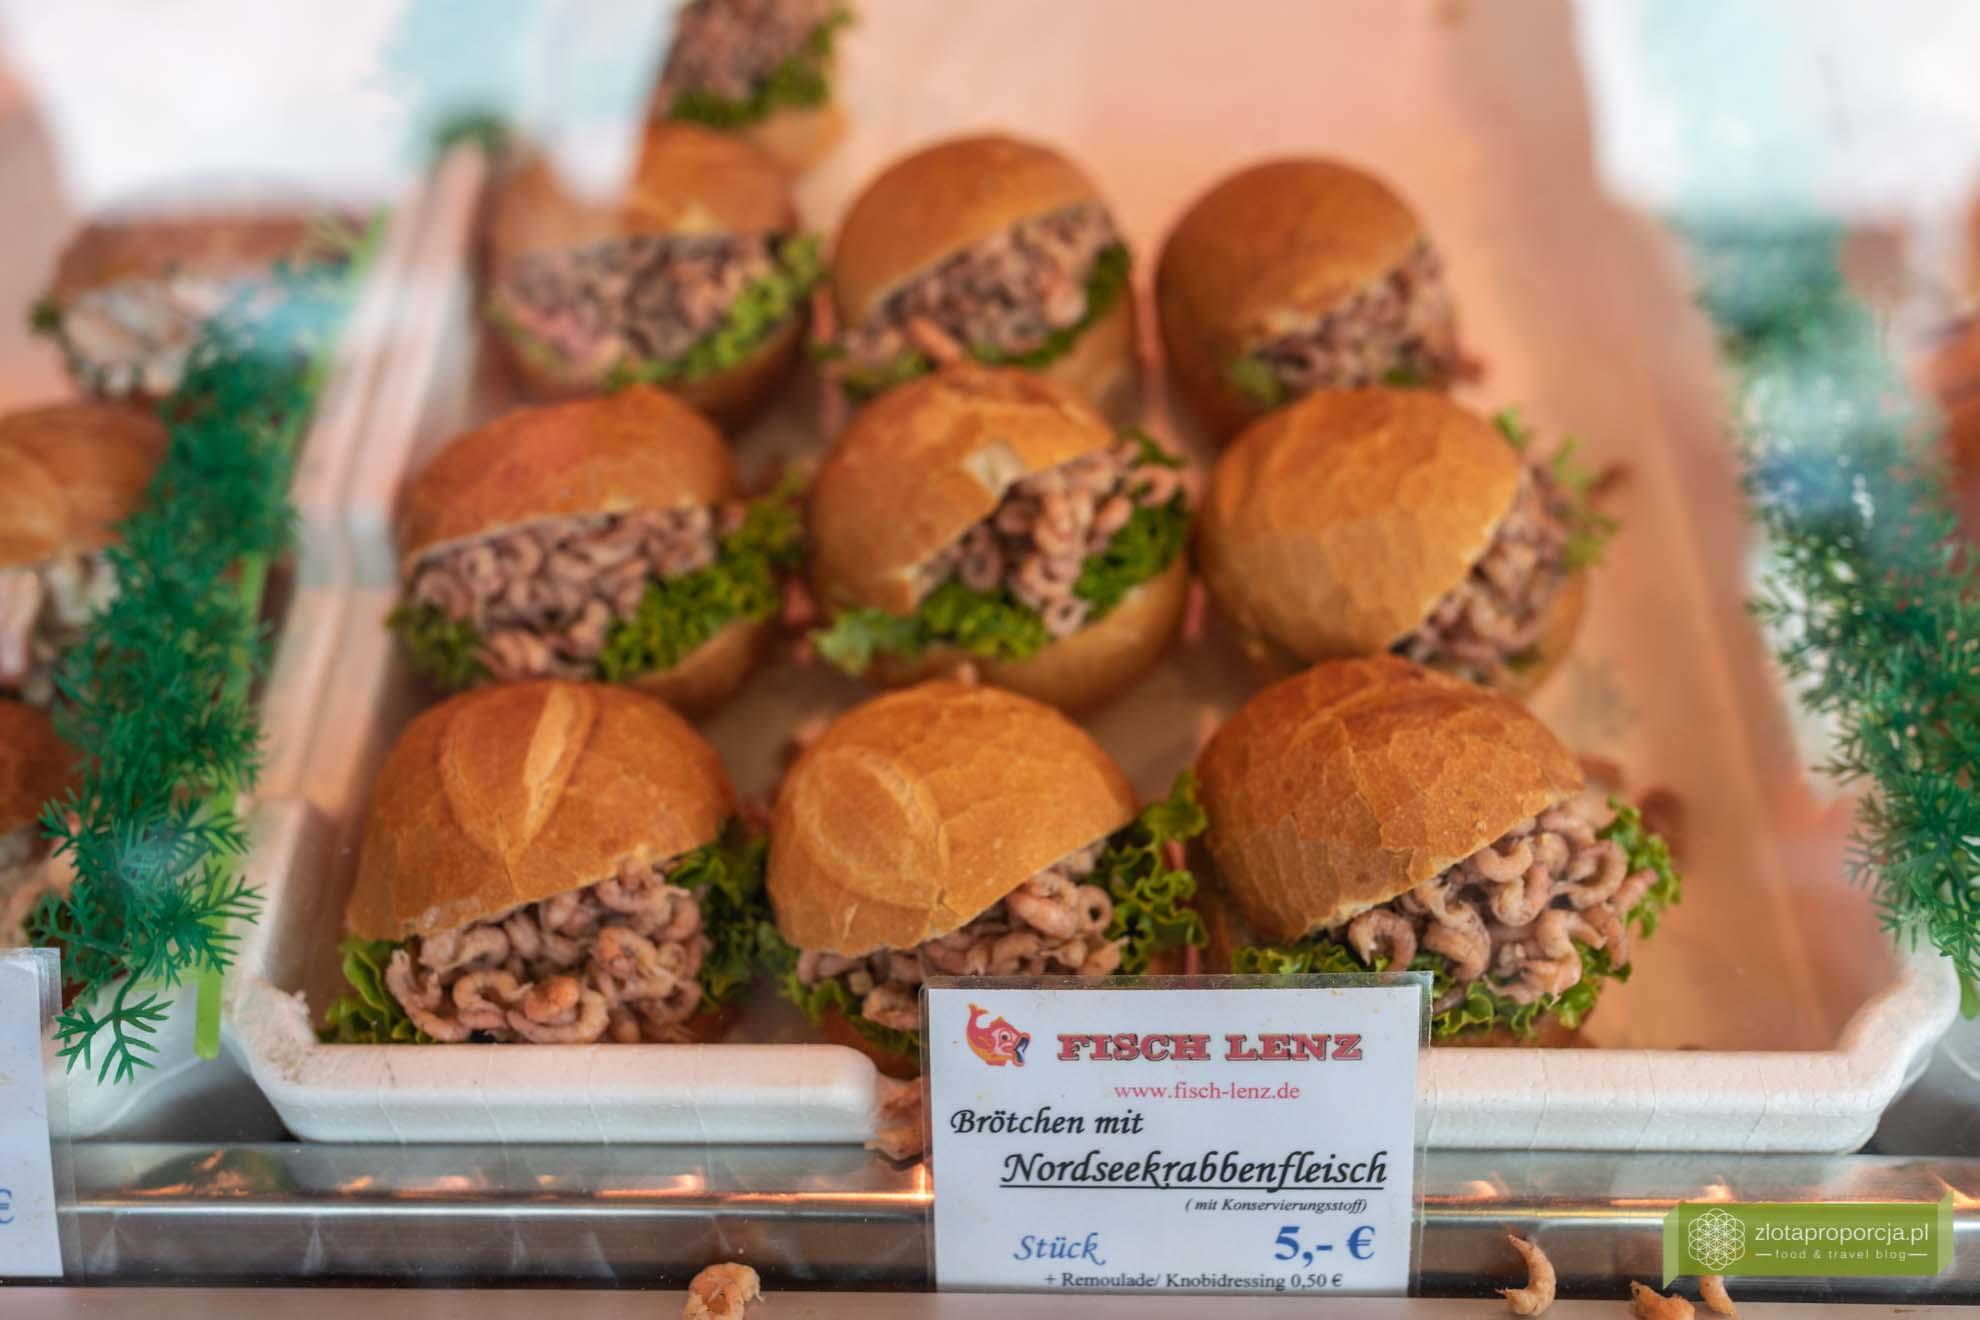 kuchnia Hamburga; kuchnia niemiecka; co zjeść w Hamburgu; potrawy Hamburga; targ rybny w Hamburgu; Fischmarkt Hamburg; atrakcje Hamburga;